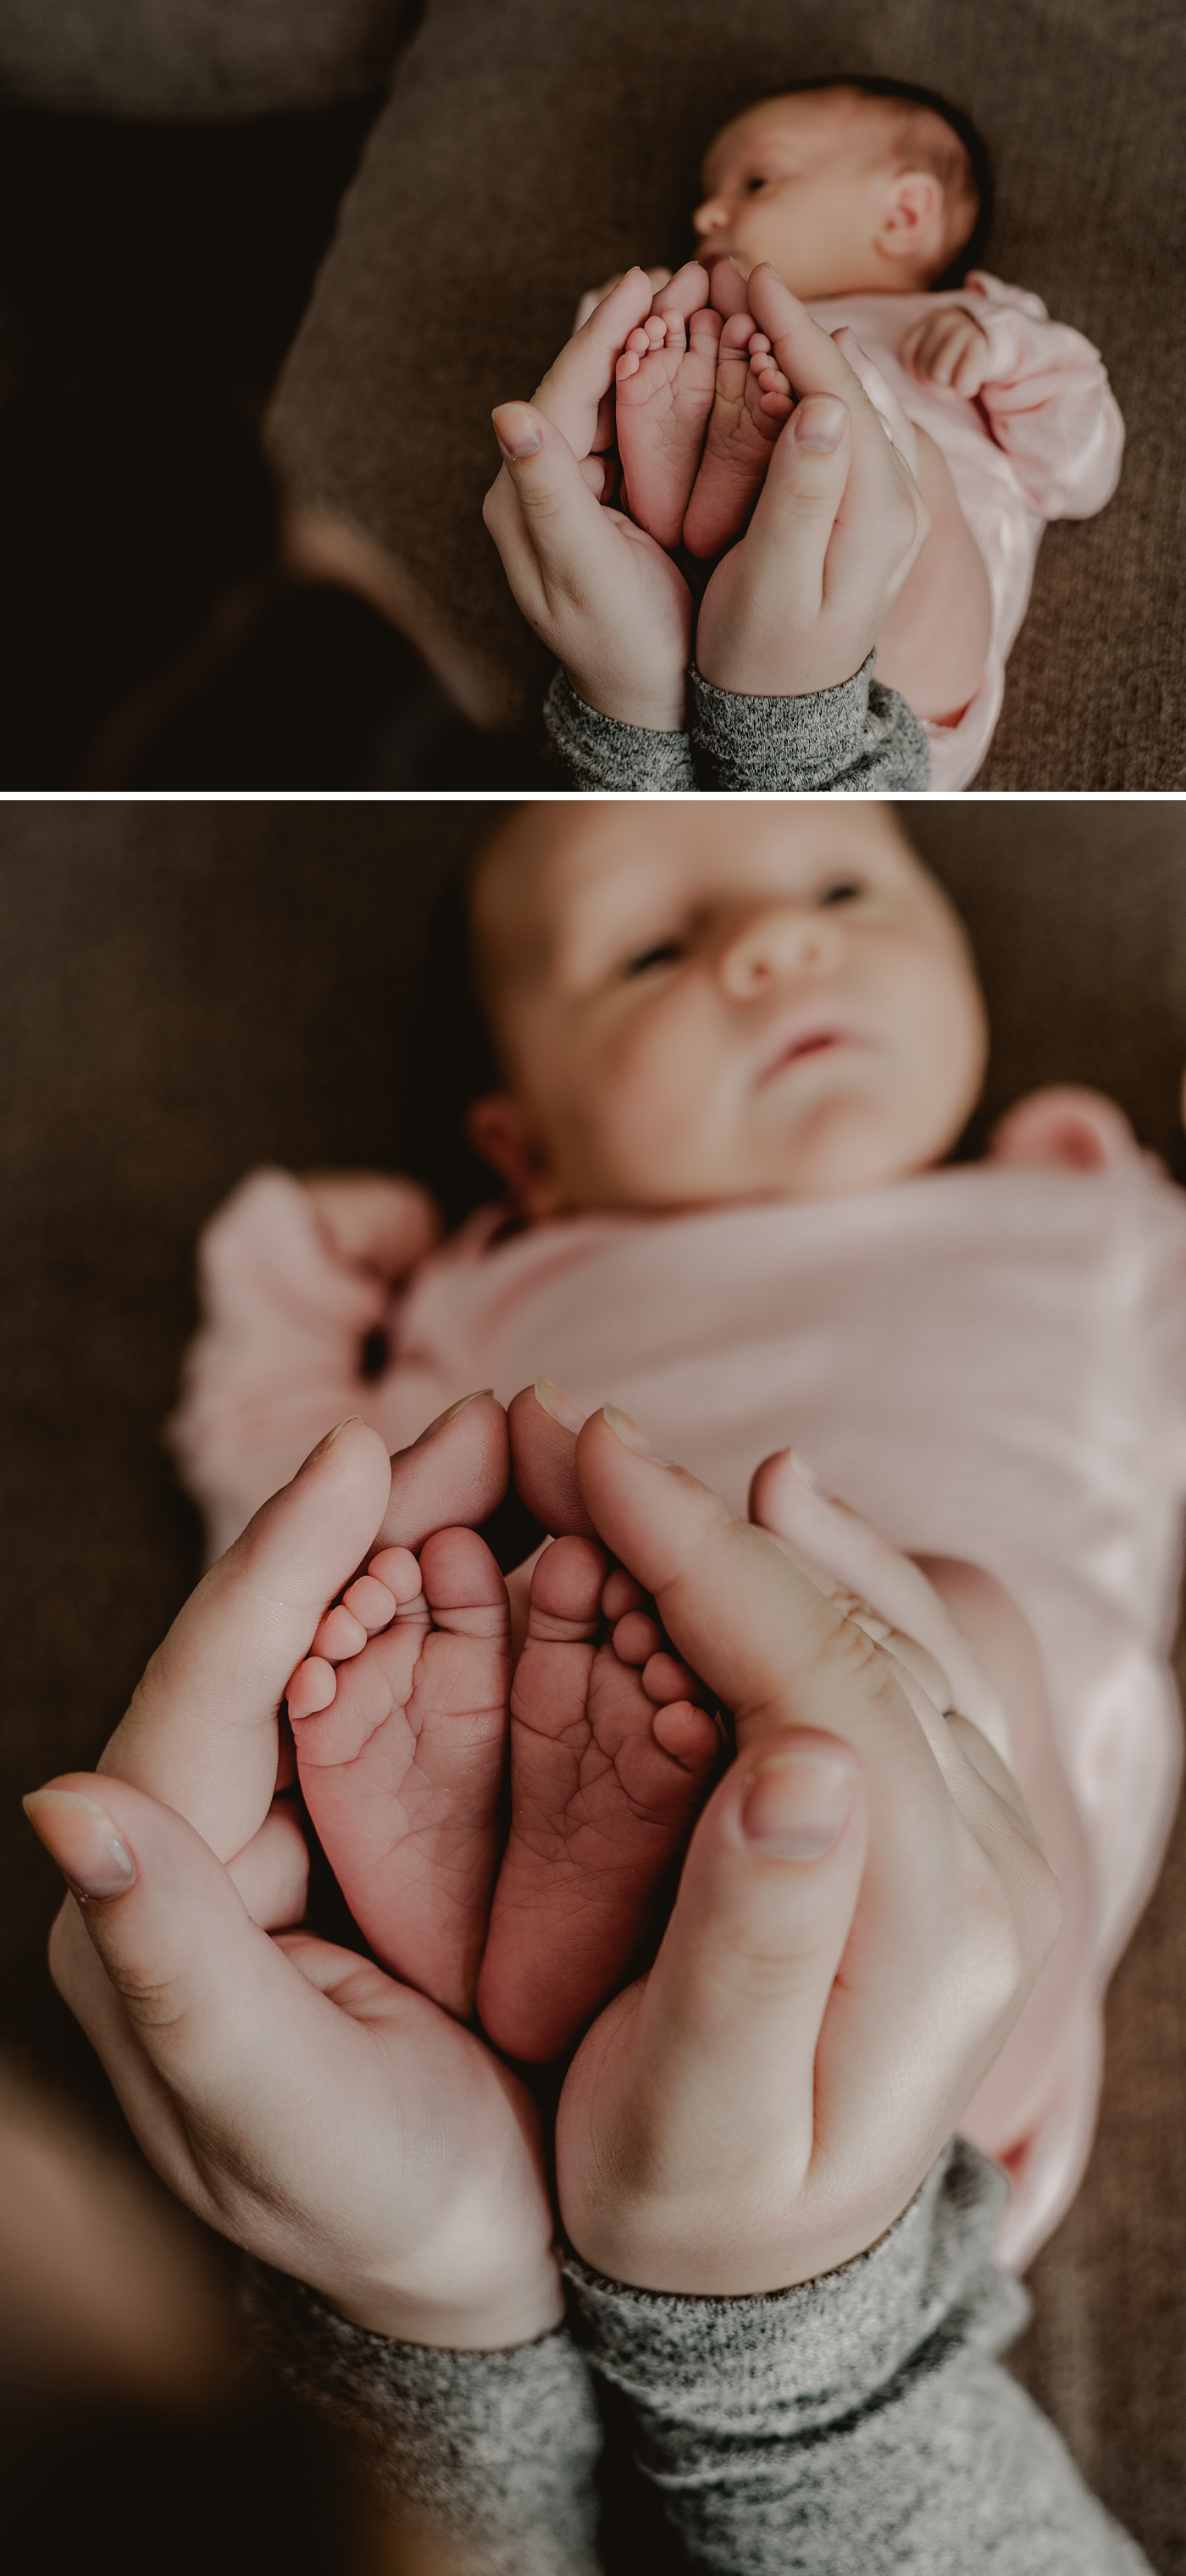 Cozy-Home-Lifestyle-Newborn-Photography_0028.jpg